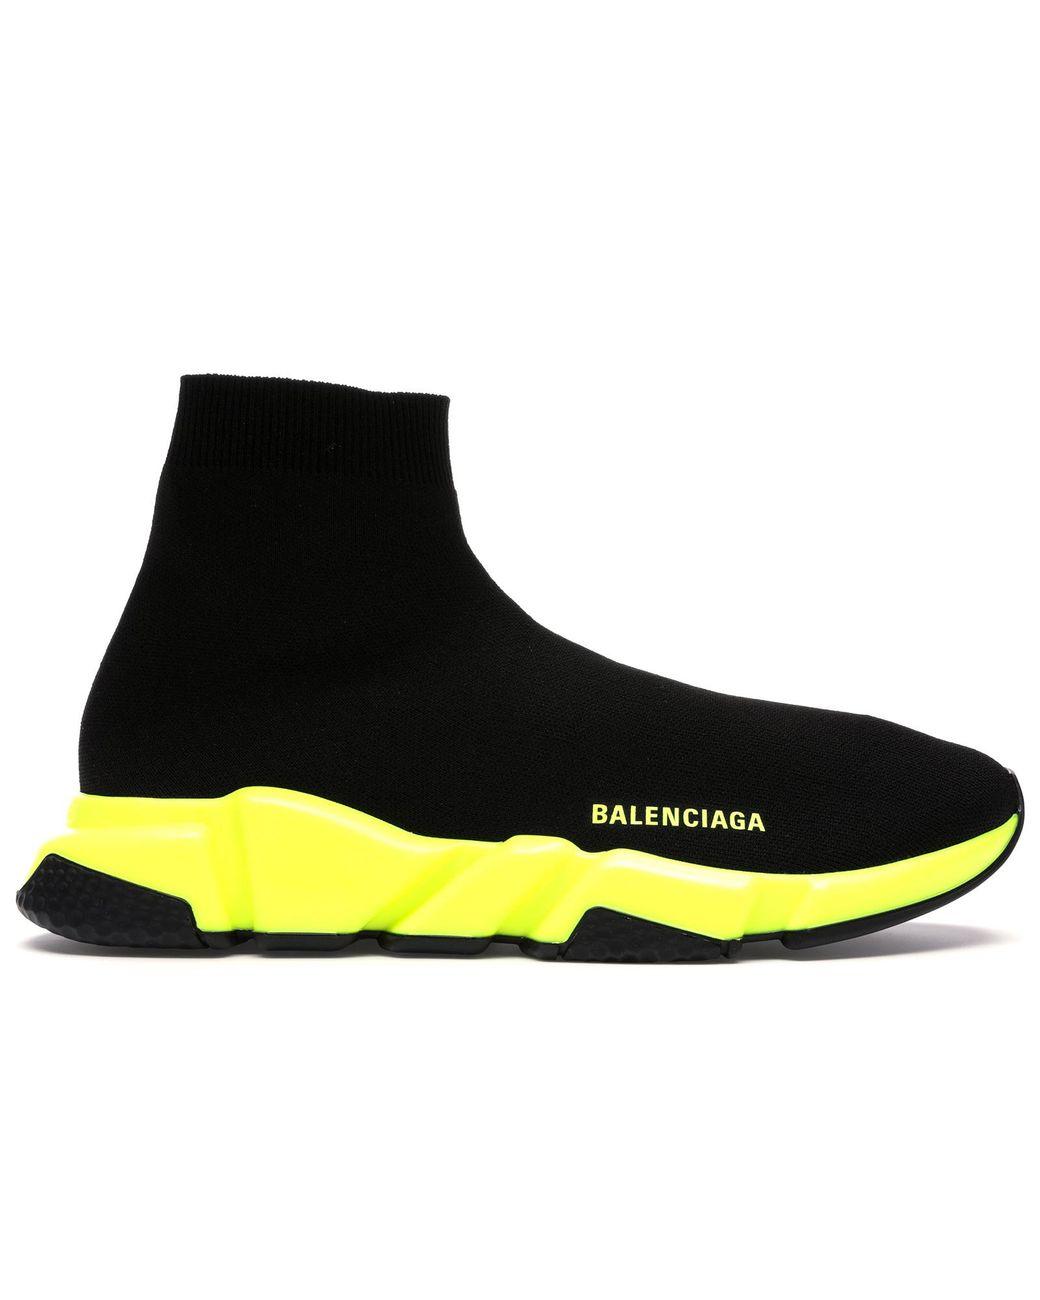 Balenciaga Speed Trainer Black Yellow